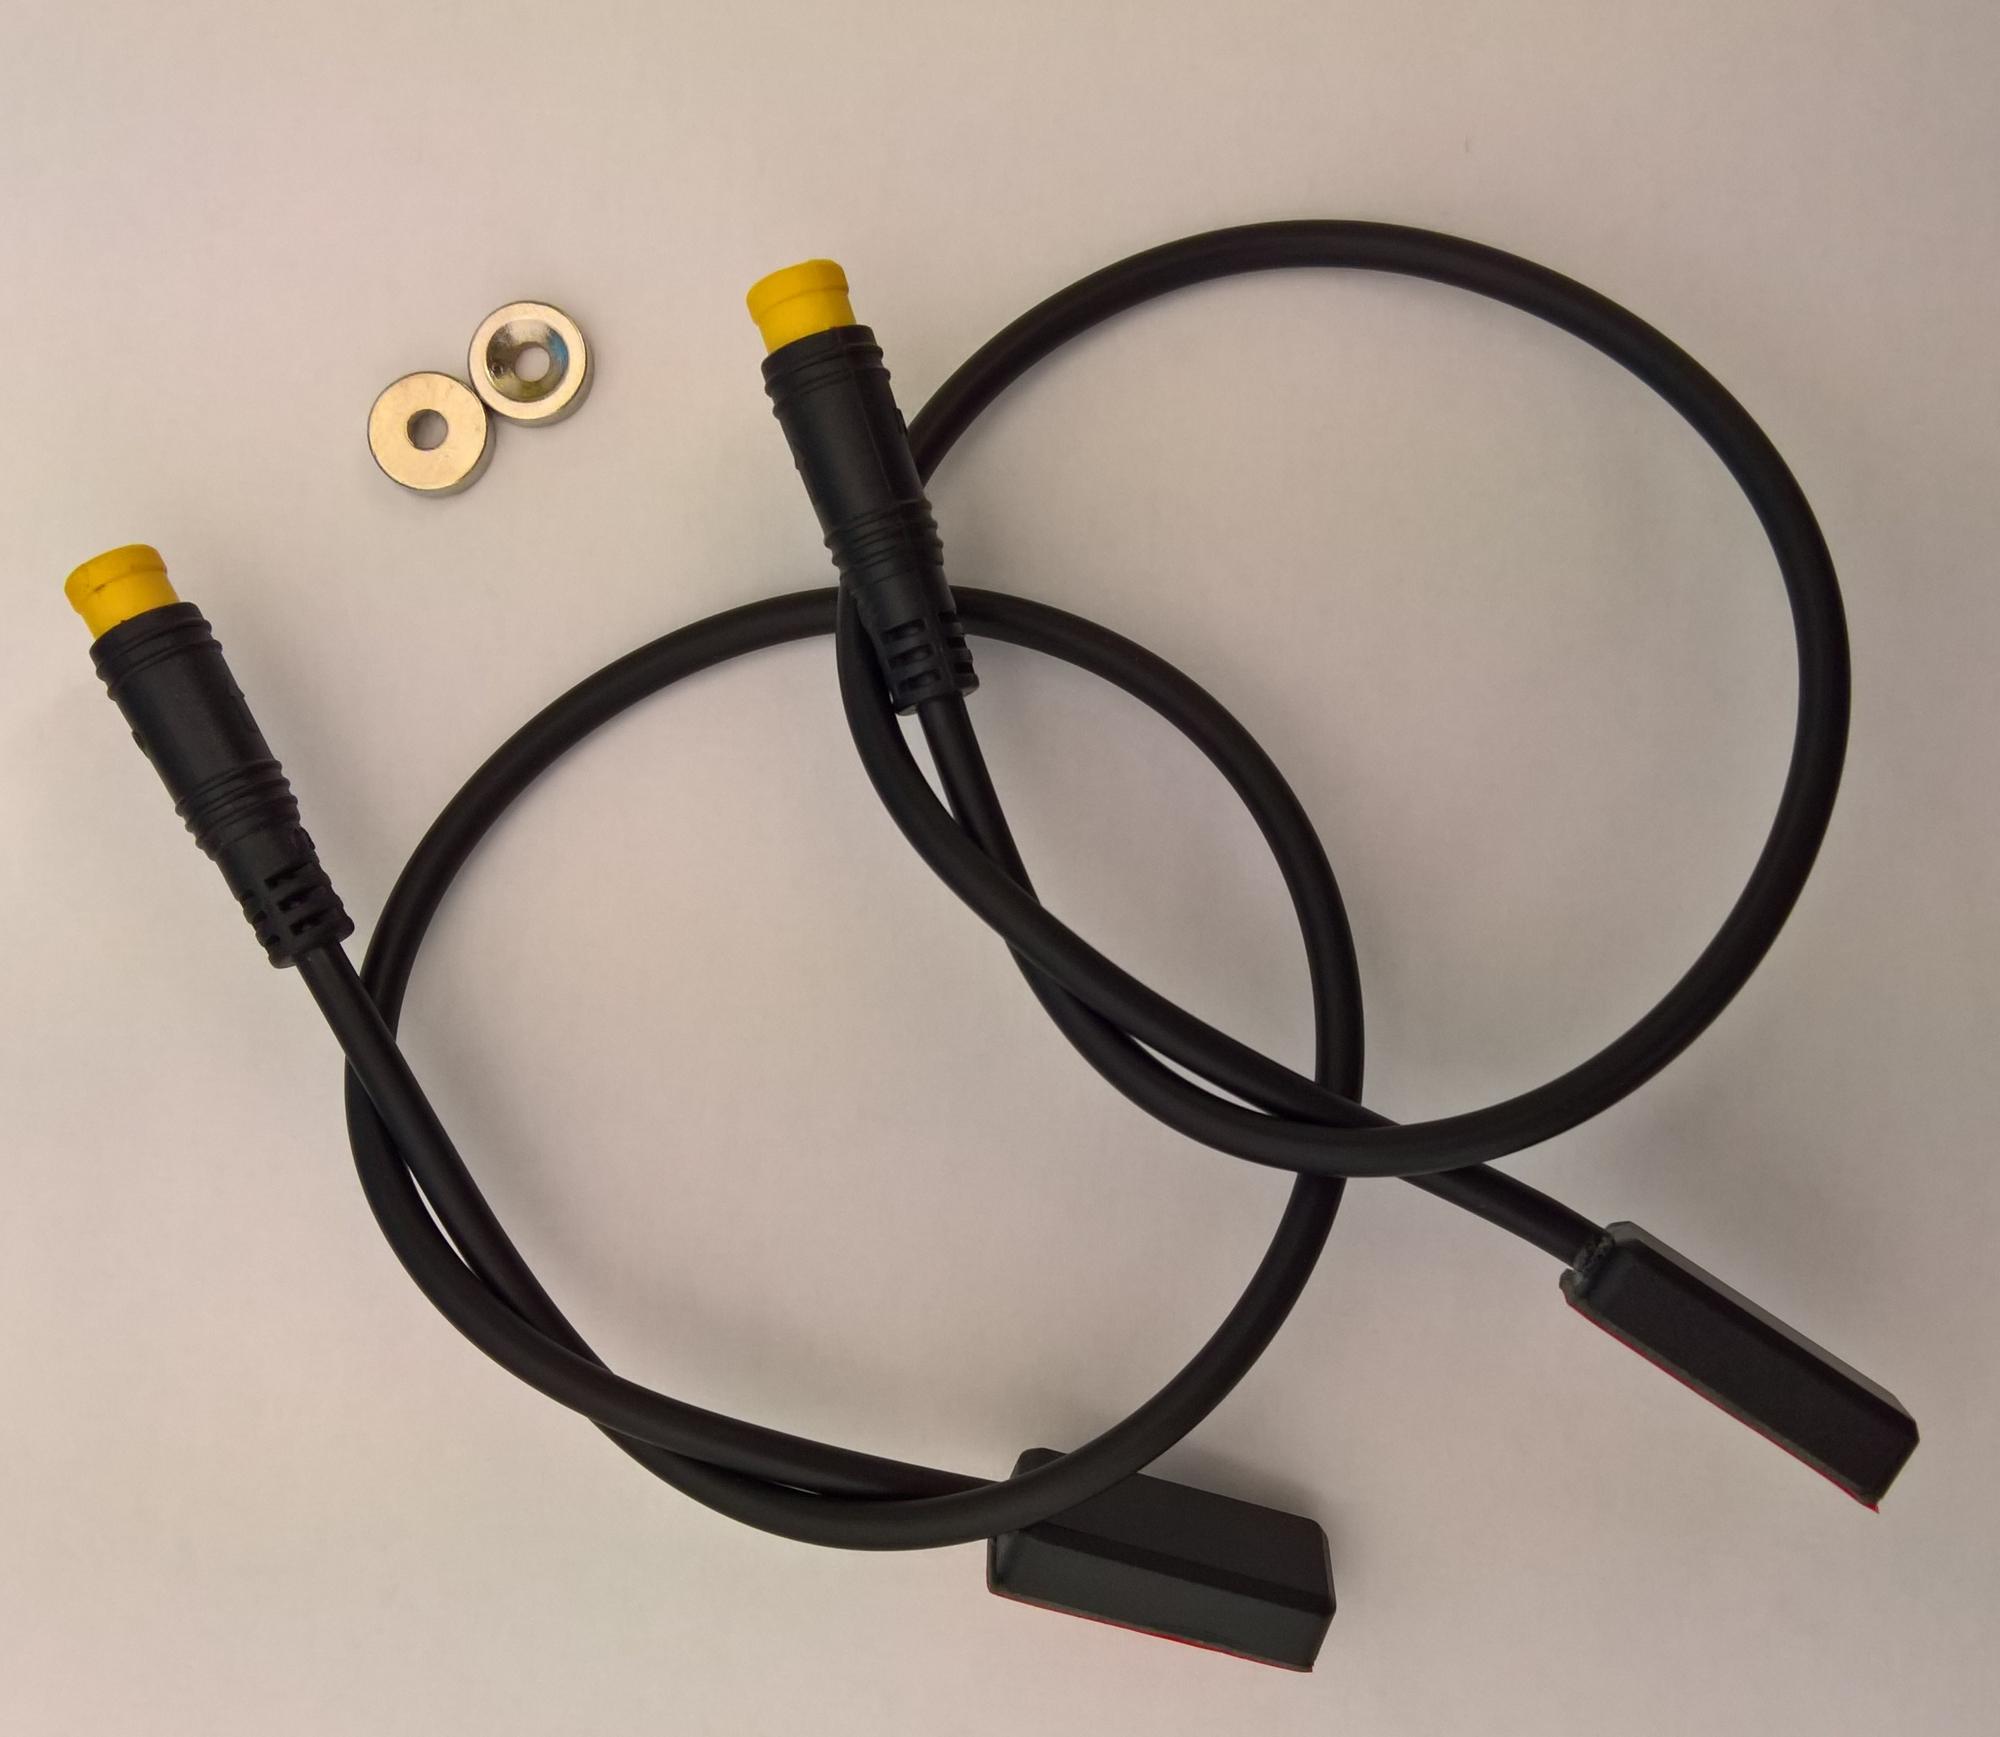 8-Fun BBS01 CD kit | Chain Drive Electric Bike Kits from Woosh